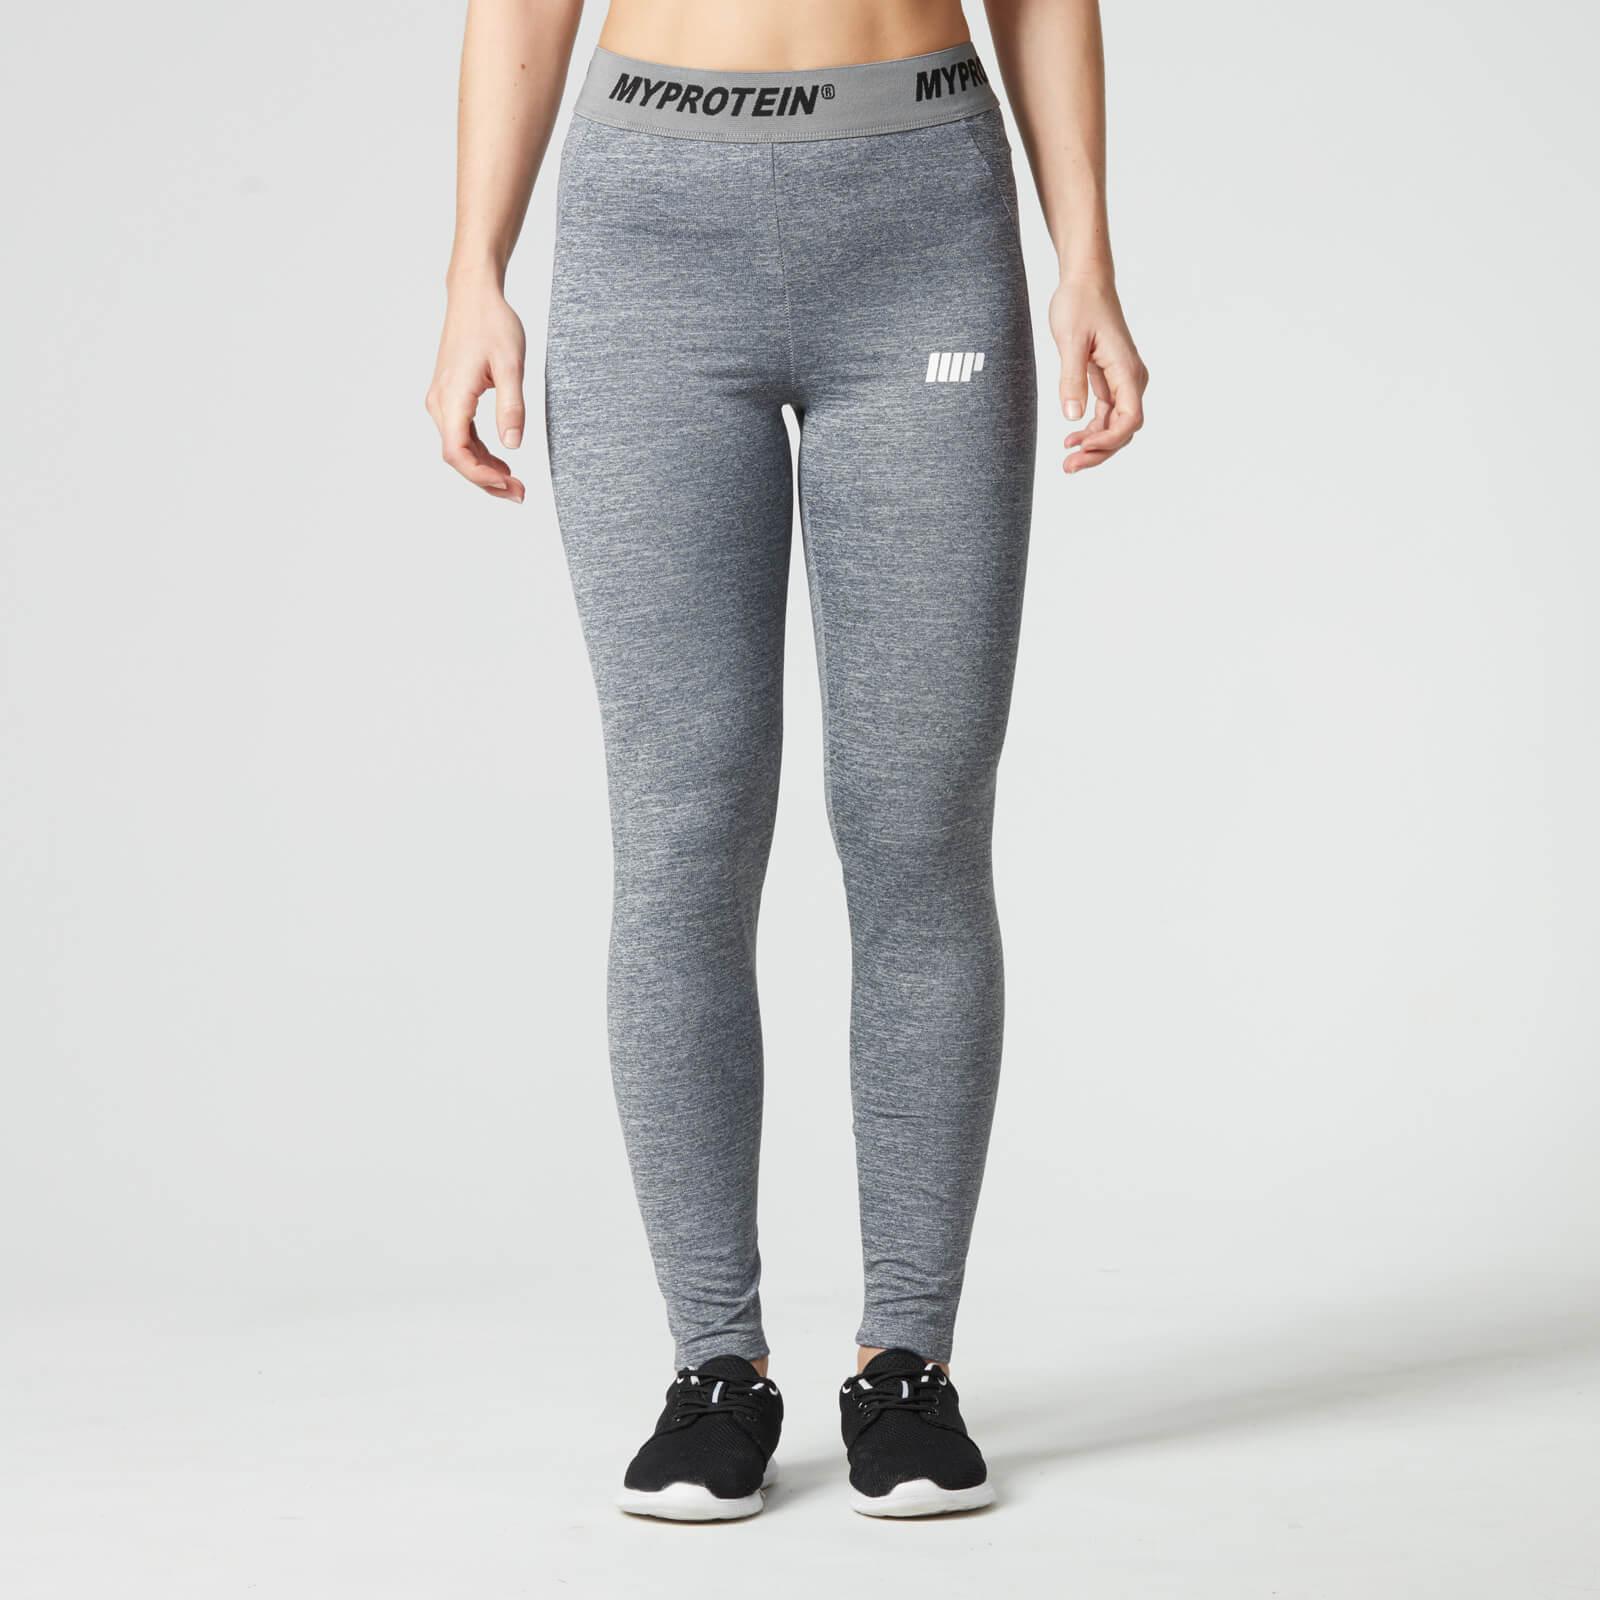 Fitness Leggings South Africa: Myprotein Women's Core Leggings - Grey Marl